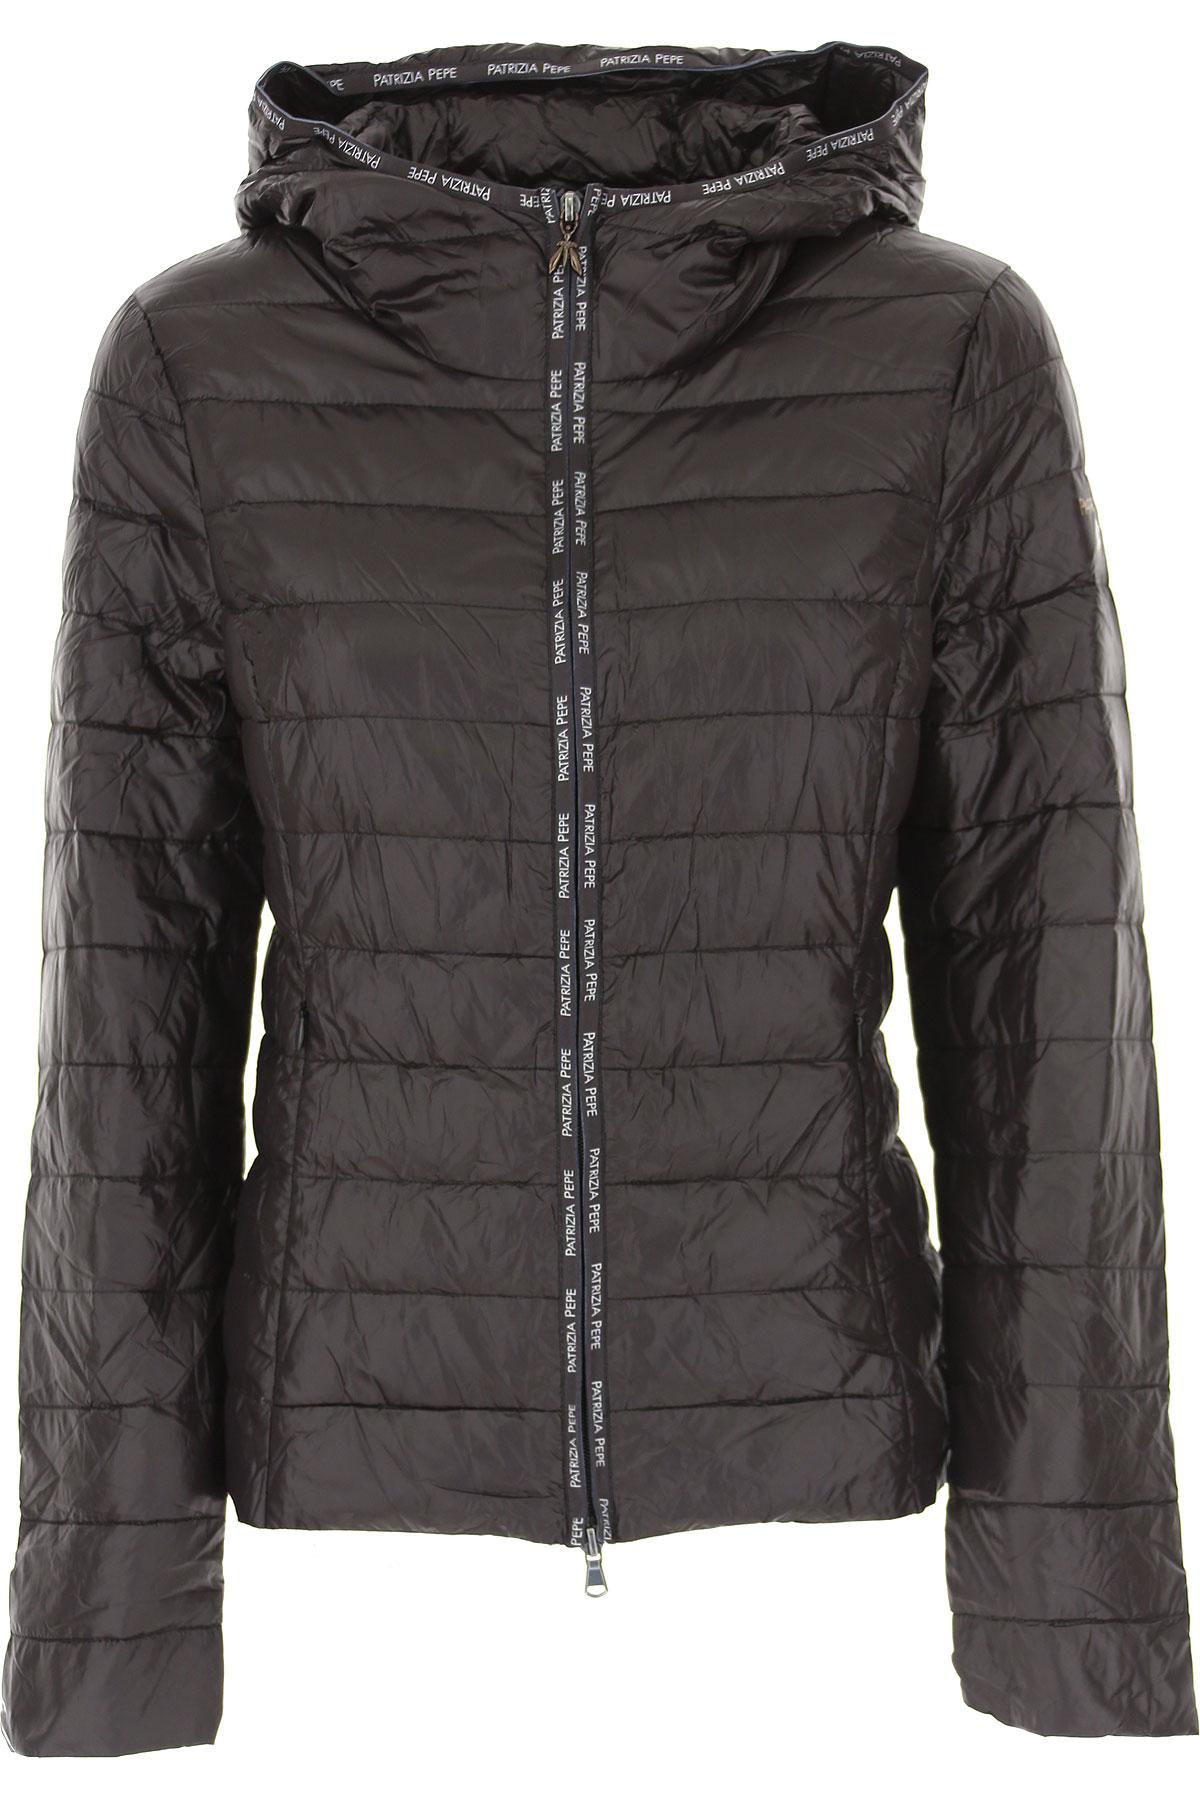 Patrizia Pepe Jacket for Women On Sale, Black, polyamide, 2019, 4 6 8